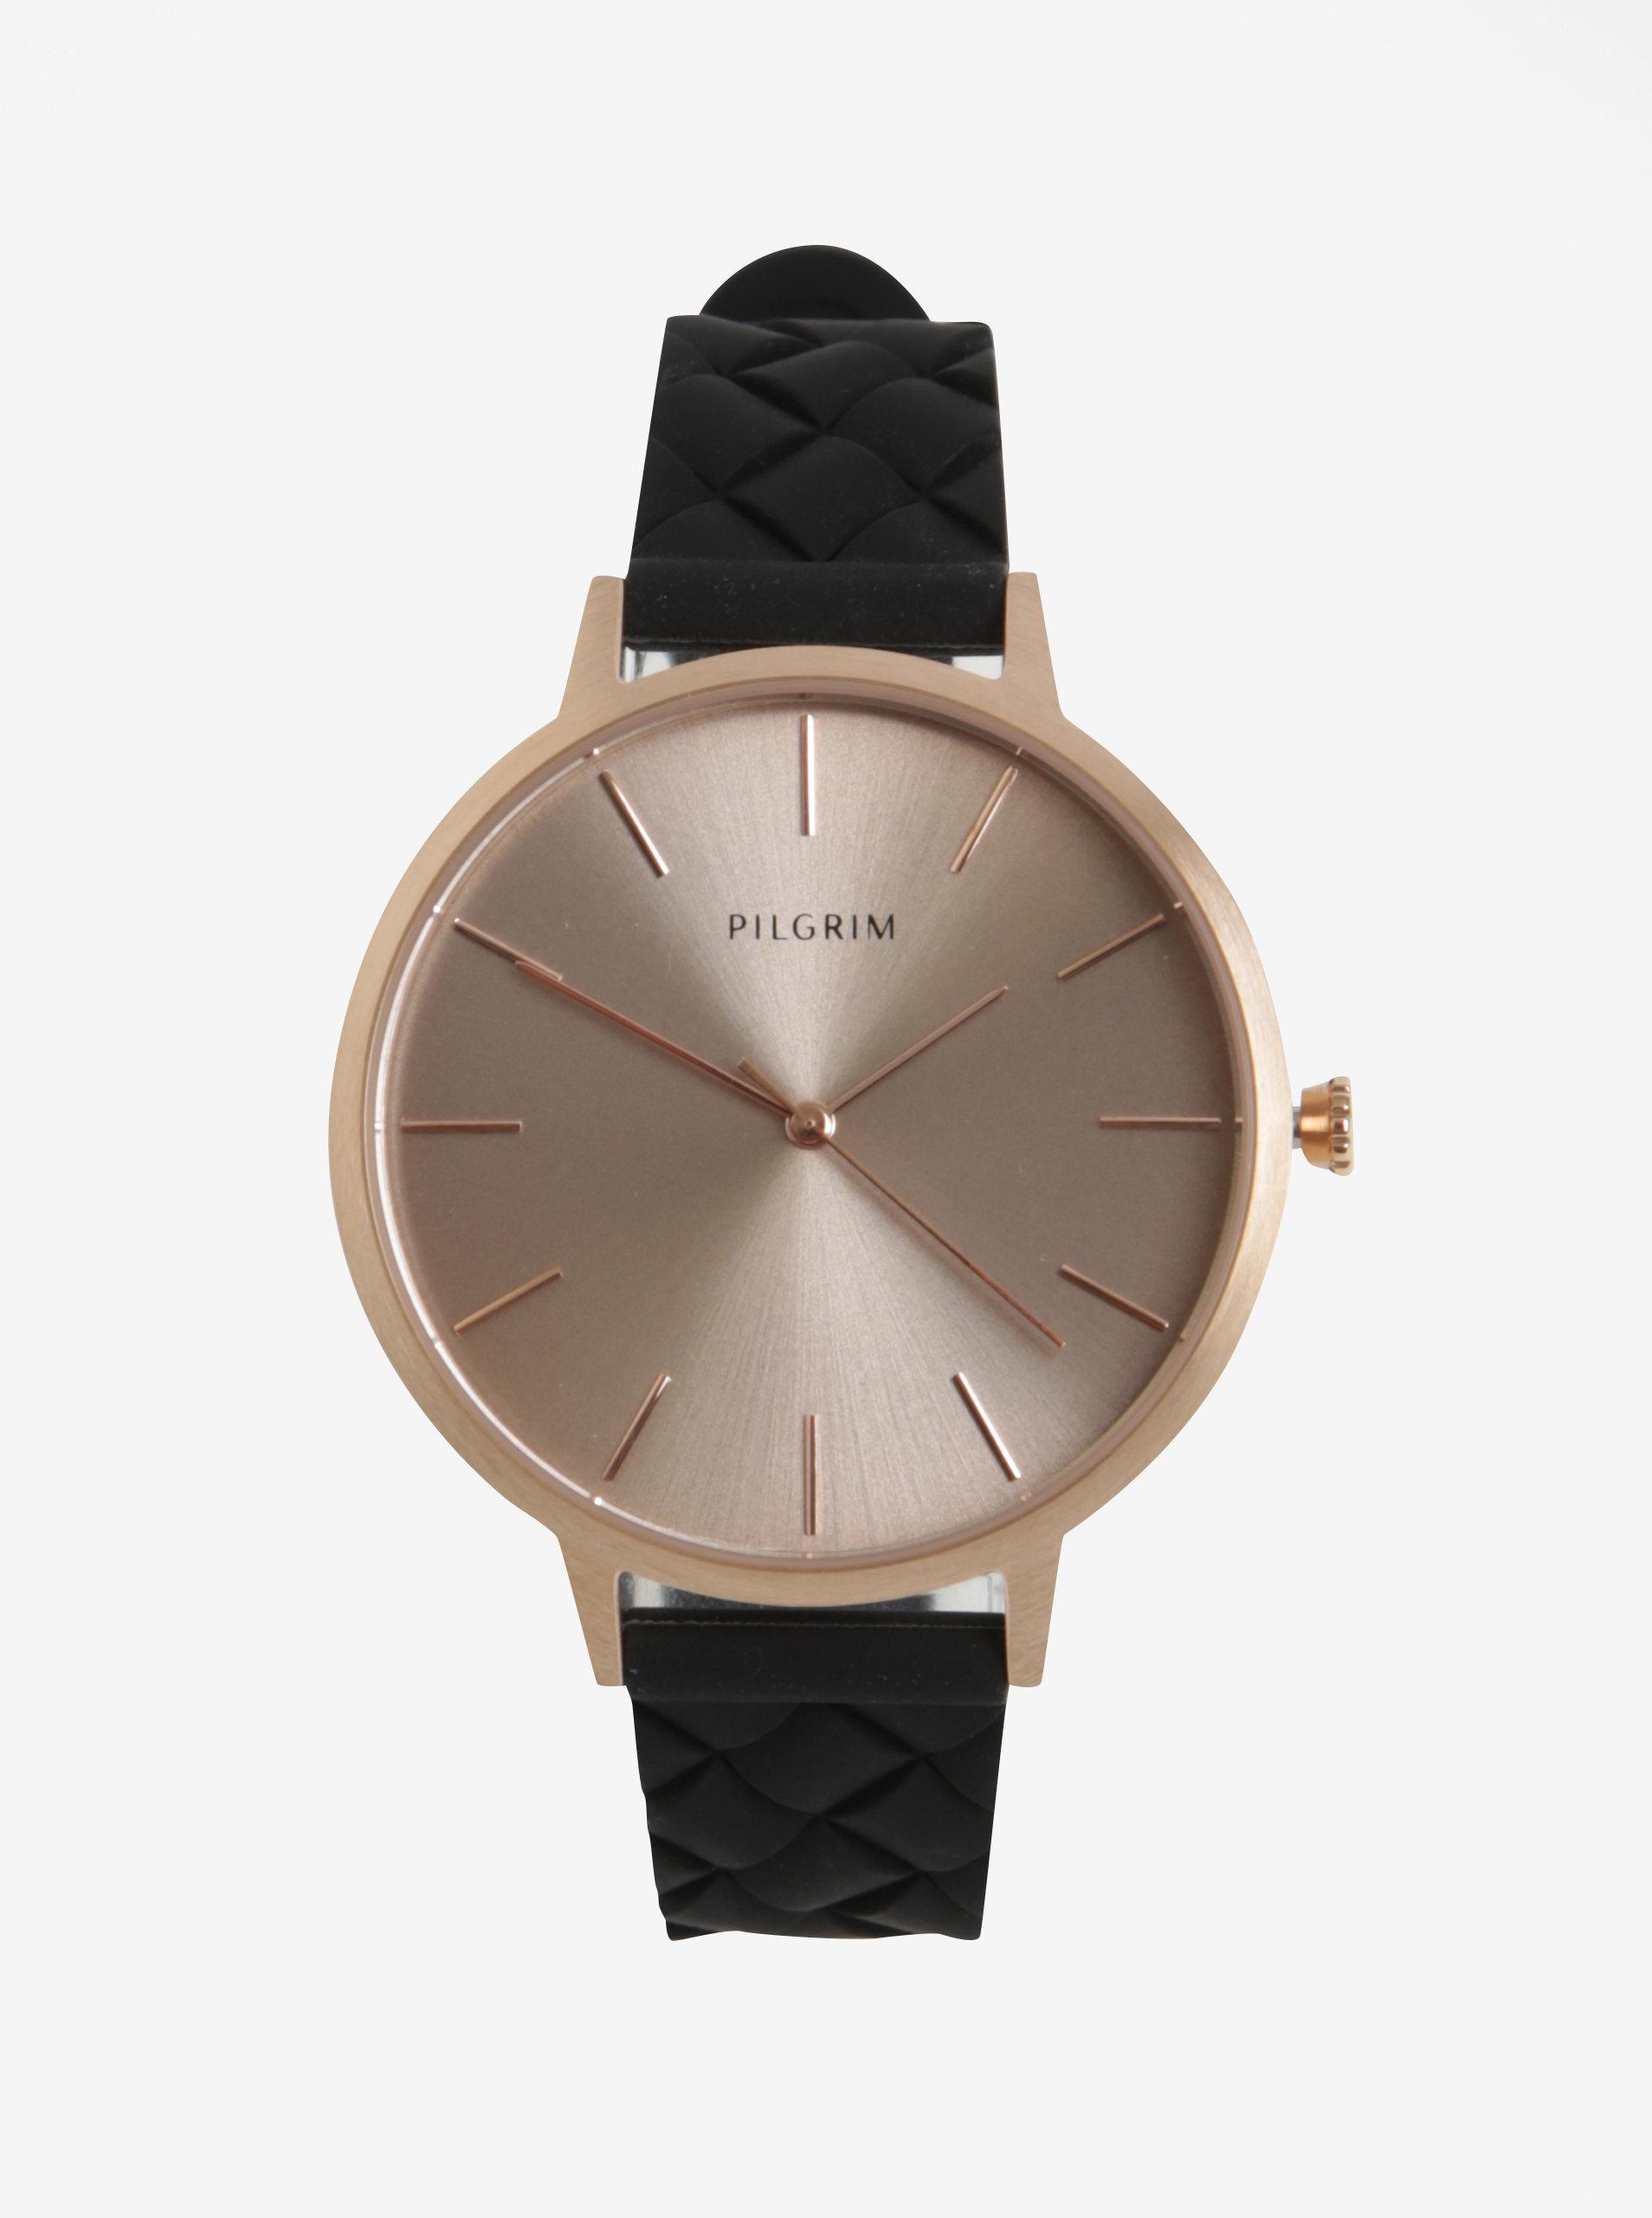 Dámské pozlacené hodinky v růžovozlaté barvě s černým silikonovým páskem  Pilgrim ... 7b9a9bd02d